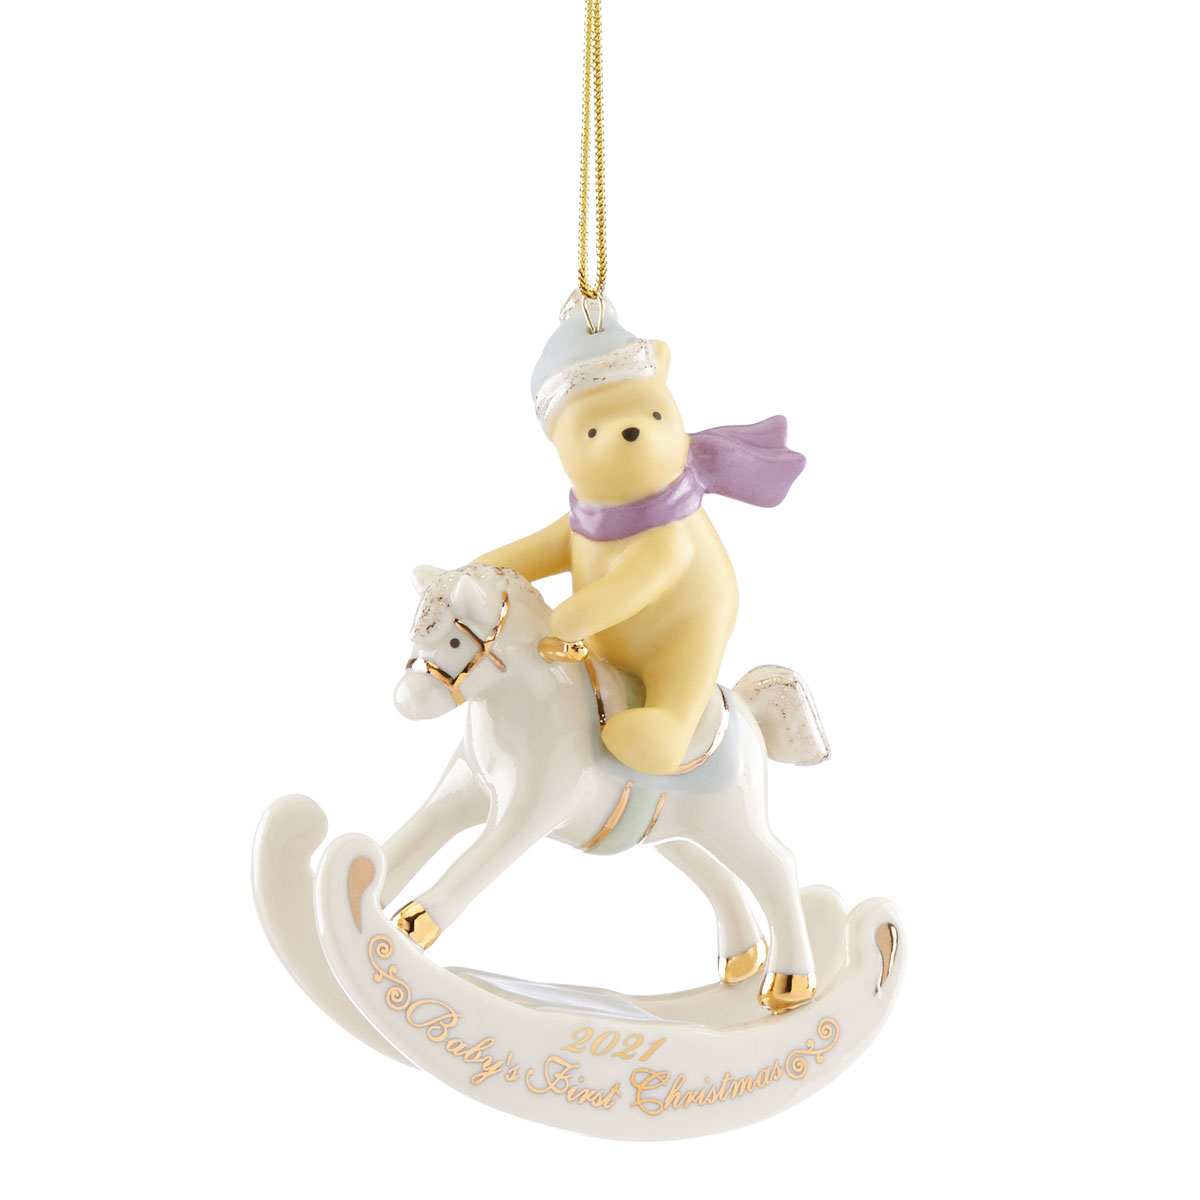 Lenox 2021 Disney 2021 Winnie the Pooh Baby